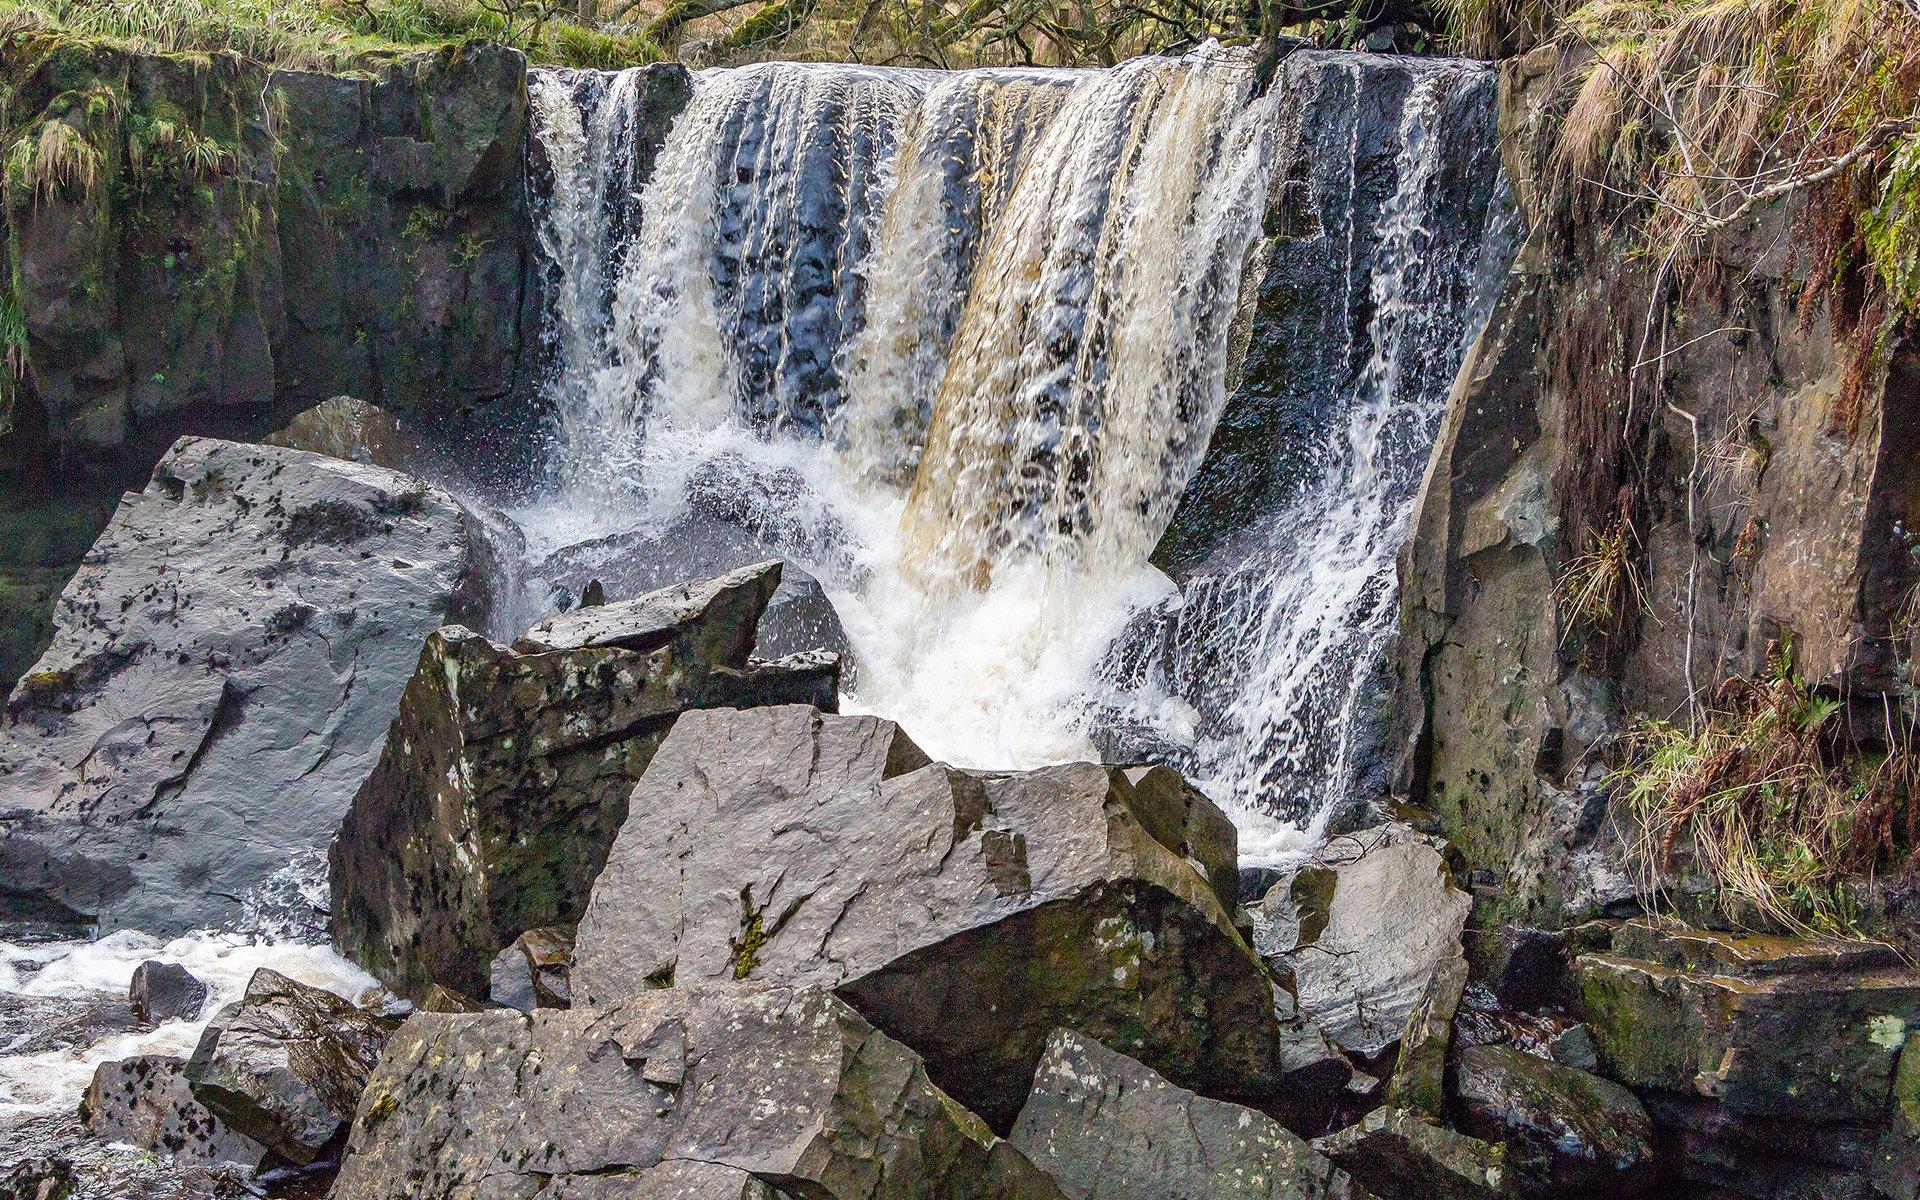 Tullydermot Falls | Droimín Creative